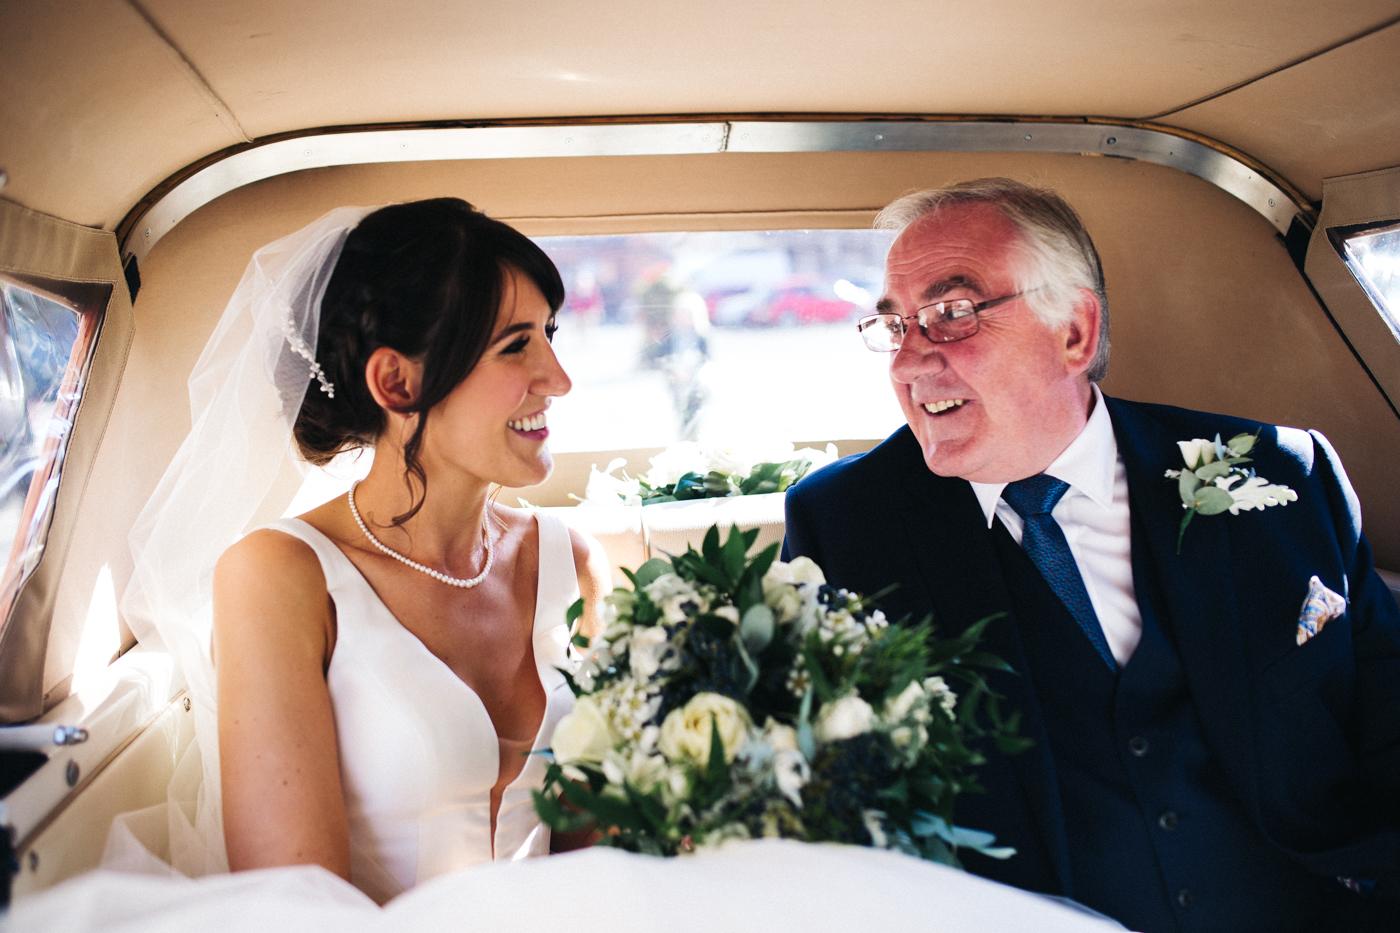 york-house-malton-wedding-photographer-north-yorkshire-0013.jpg